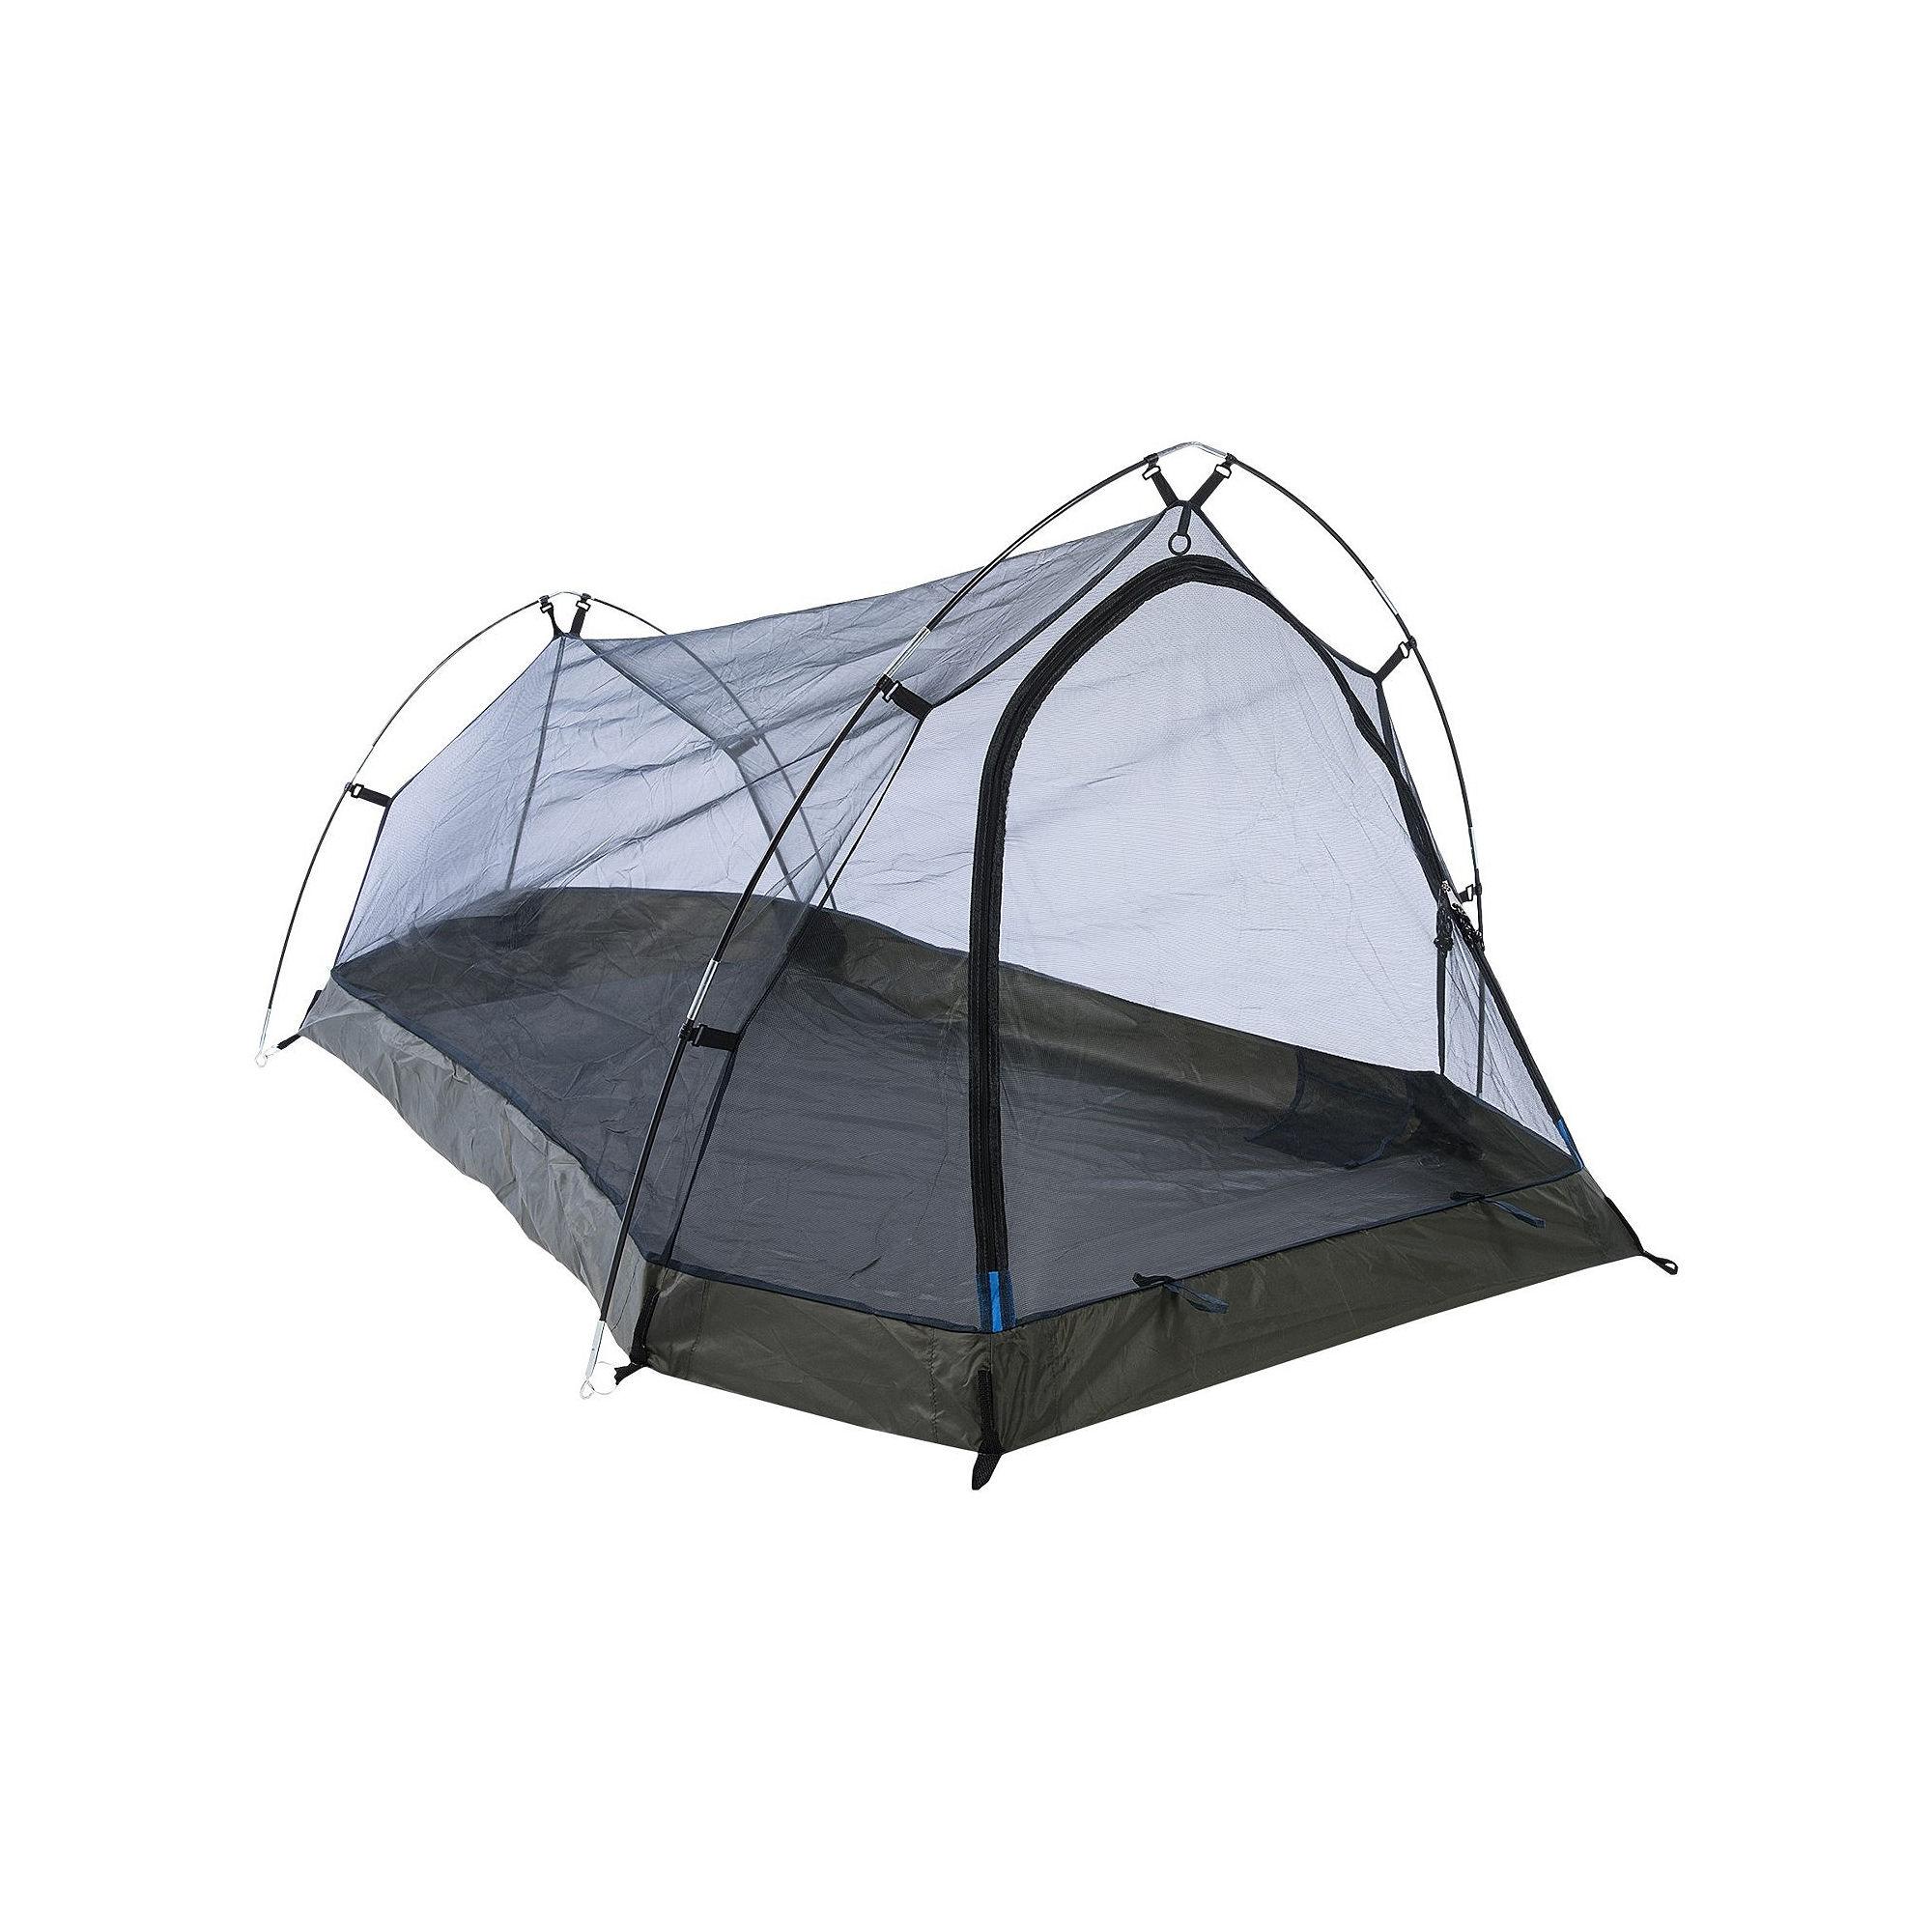 Alpine Mountain Gear Solo Plus Tent - Blue